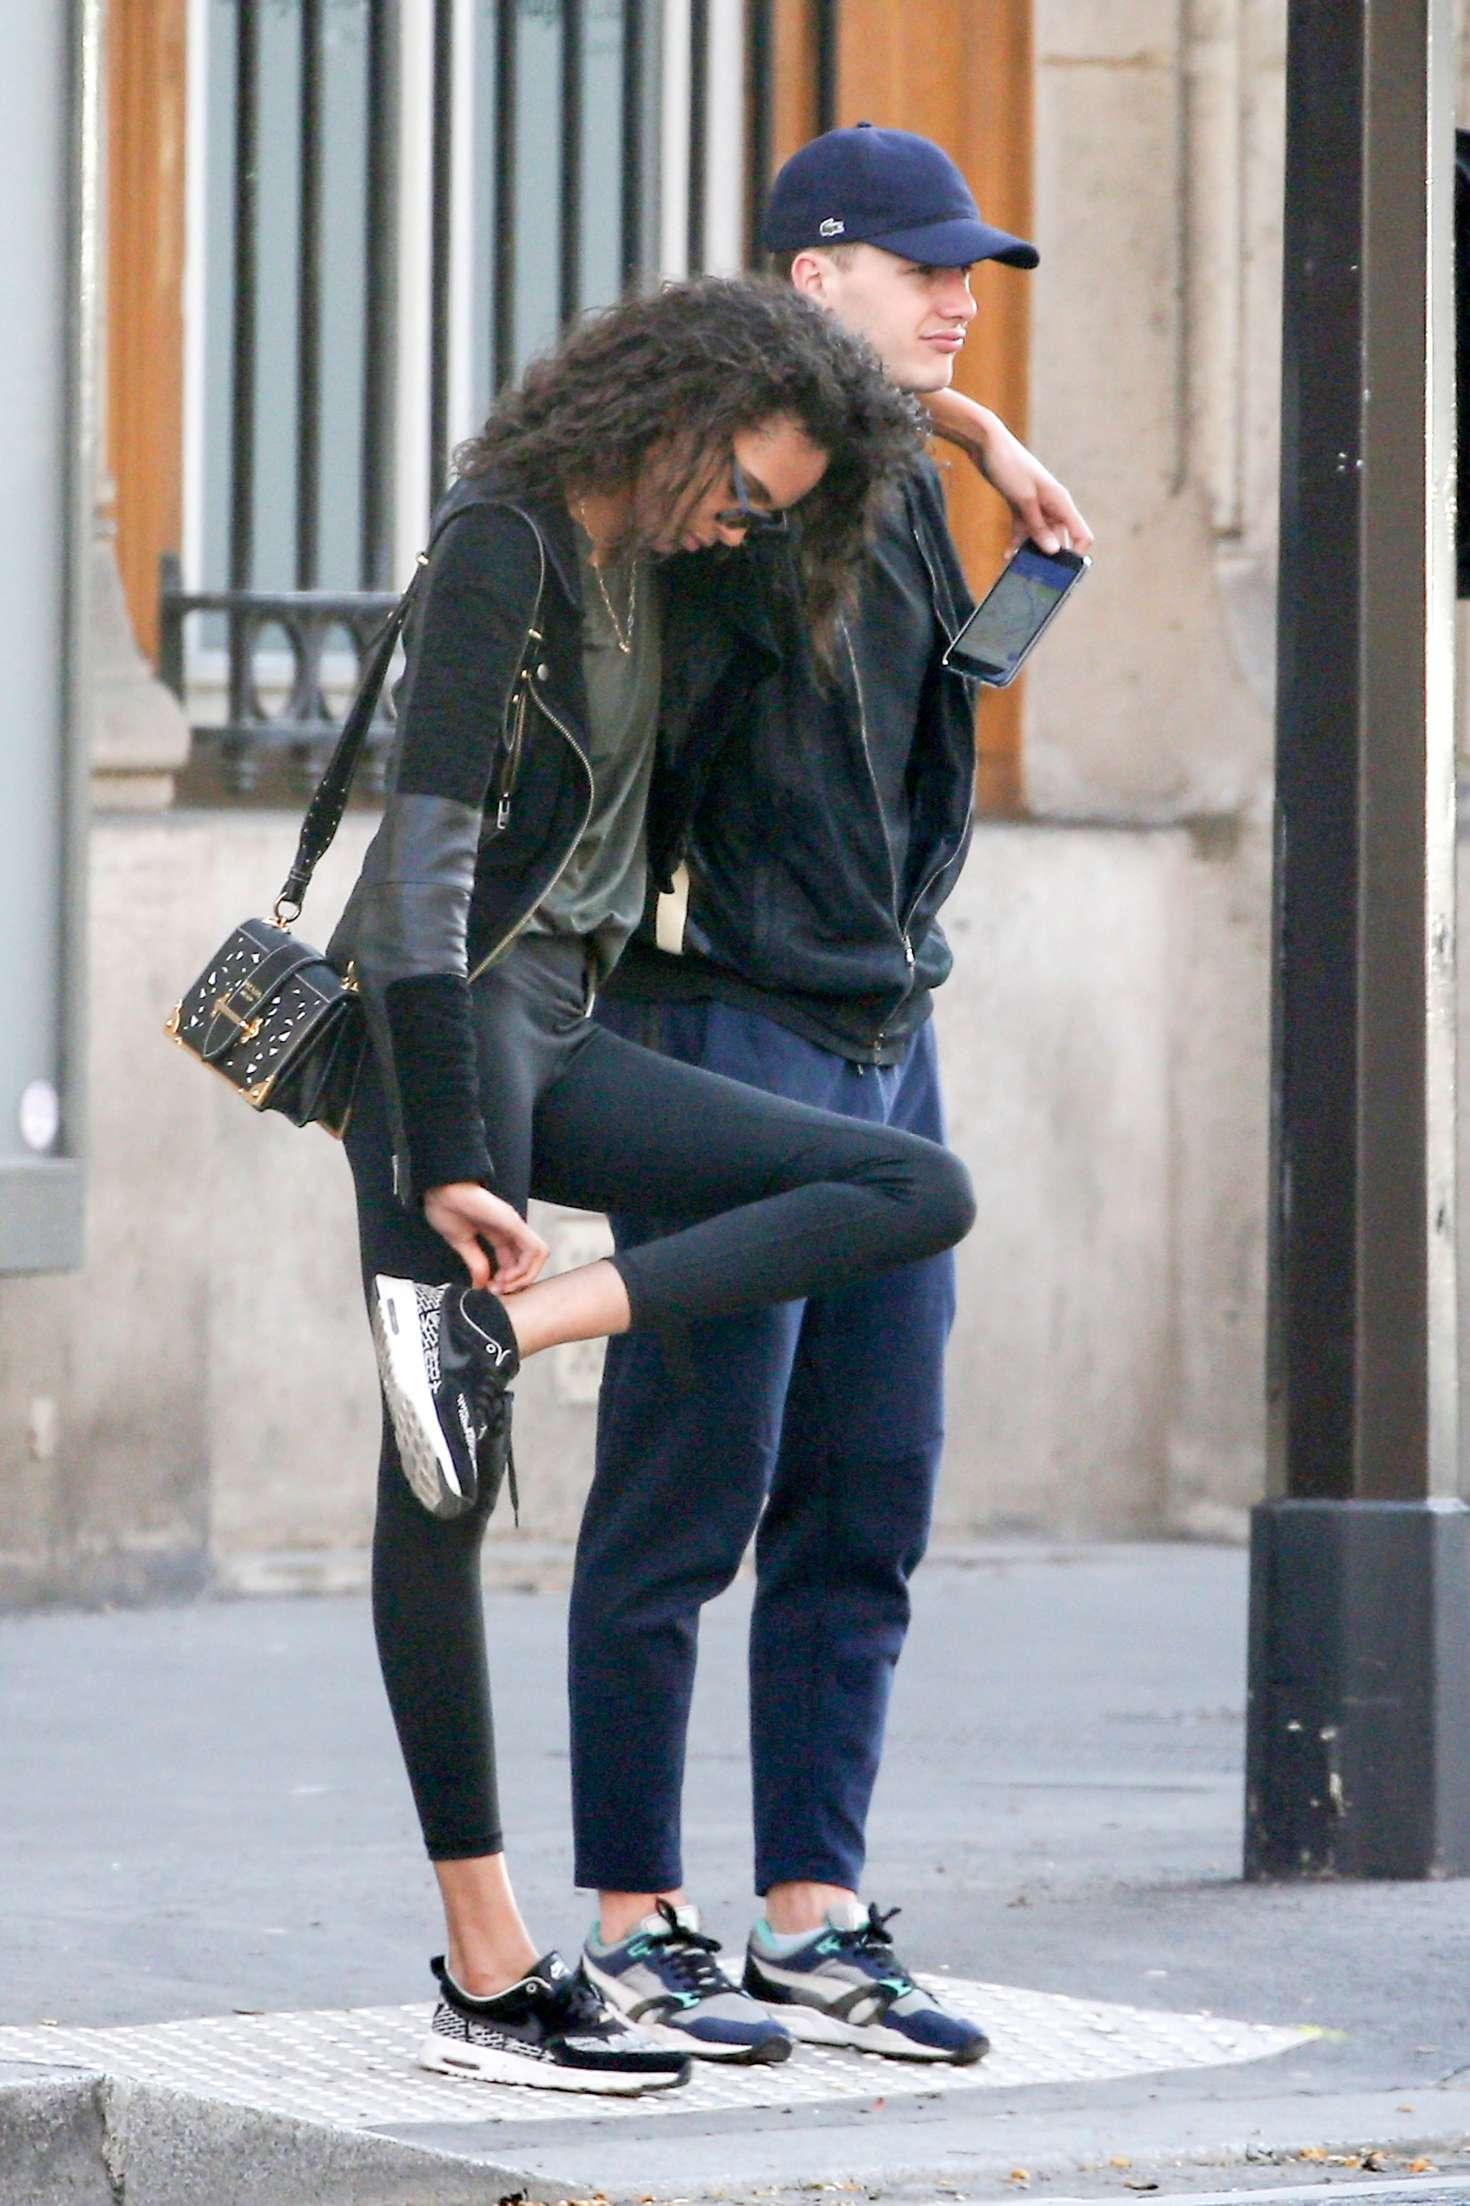 Cindy Bruna And Boyfriend Morgan Biancone Out In Paris 08